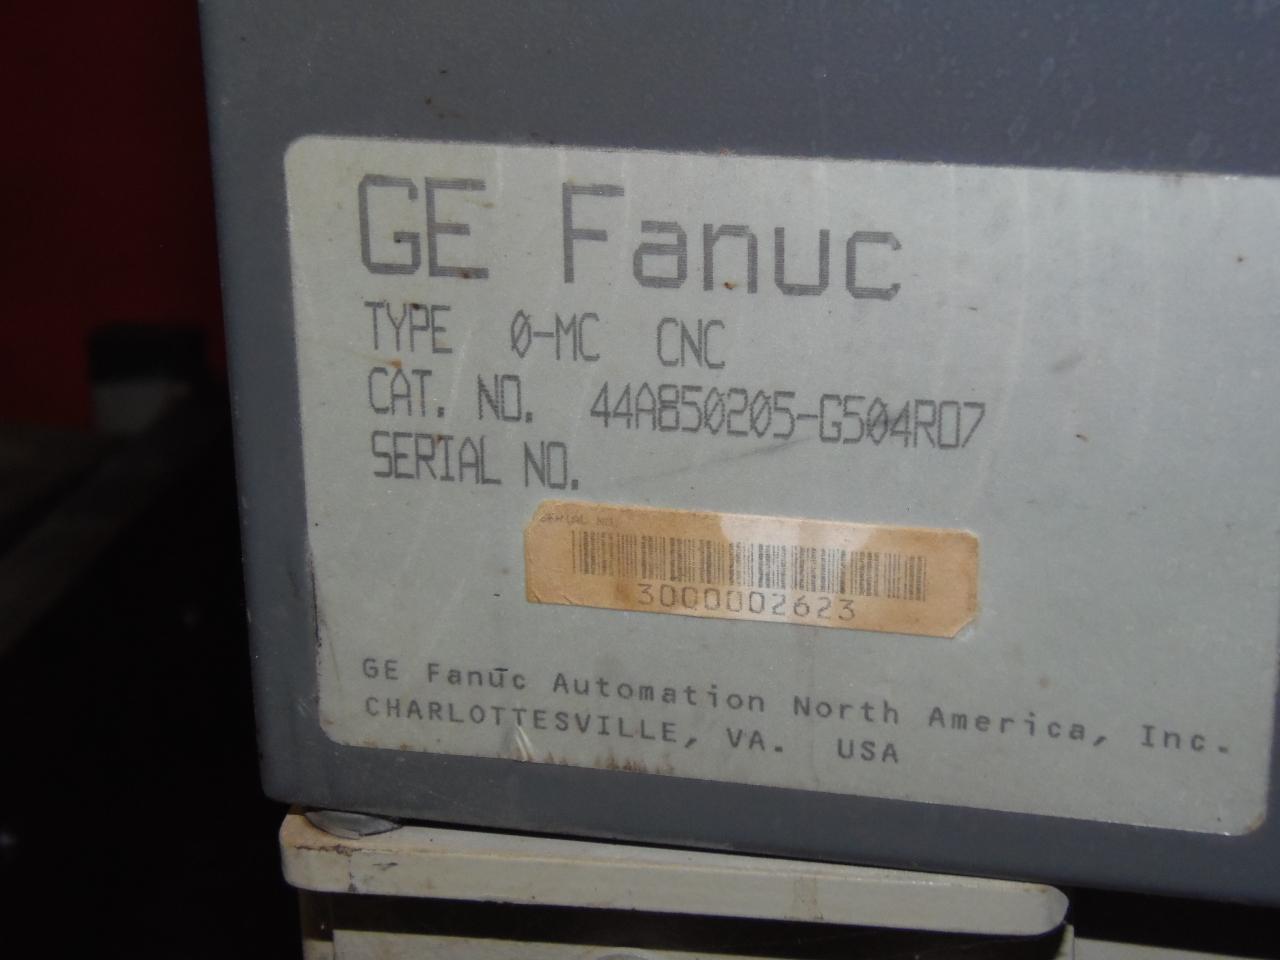 GE FANUC O-MC CNC CONTROL WITH CABINET, WITH A06B-6058-H334, A06B-6059-H203, A02B-0098-B511, 1990, FANUC 0-MC